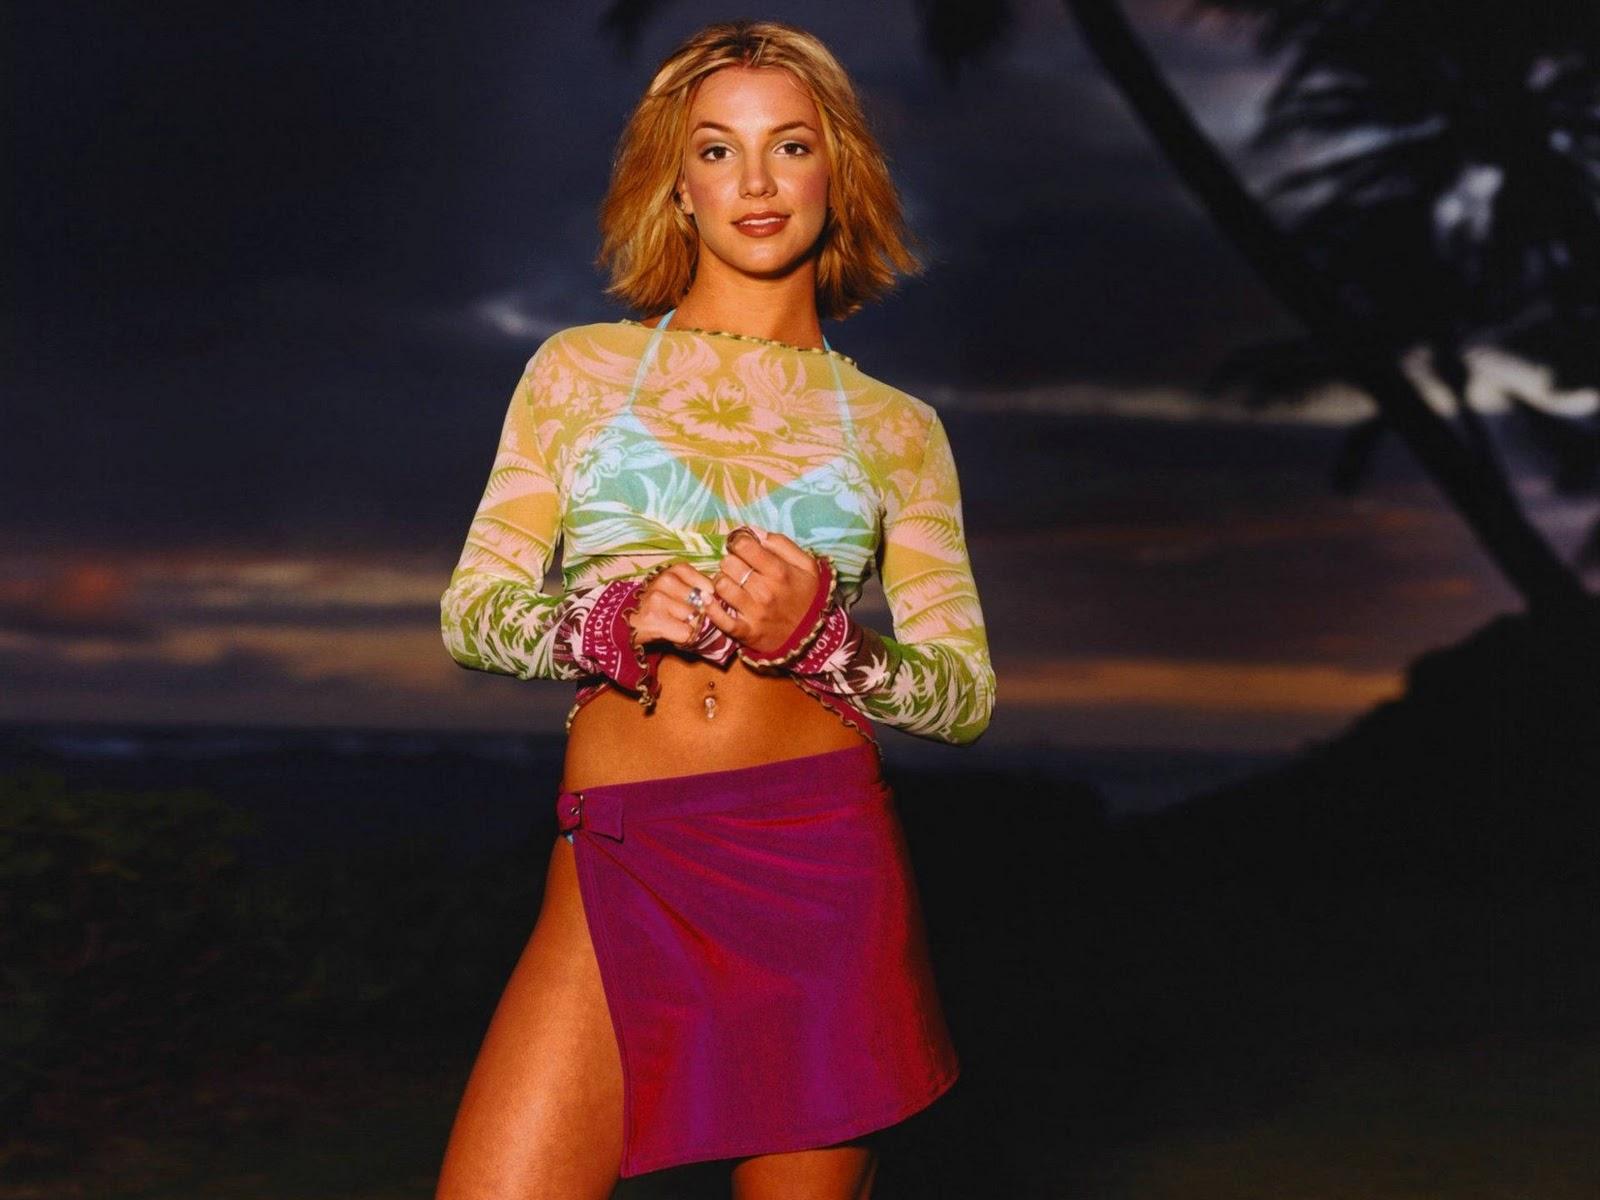 http://3.bp.blogspot.com/-6jrUcvvwpL8/TqrptV8cvKI/AAAAAAAAASI/ip20wpOwnH4/s1600/Britney+Spears+Wallpaper+%252837%2529.jpg